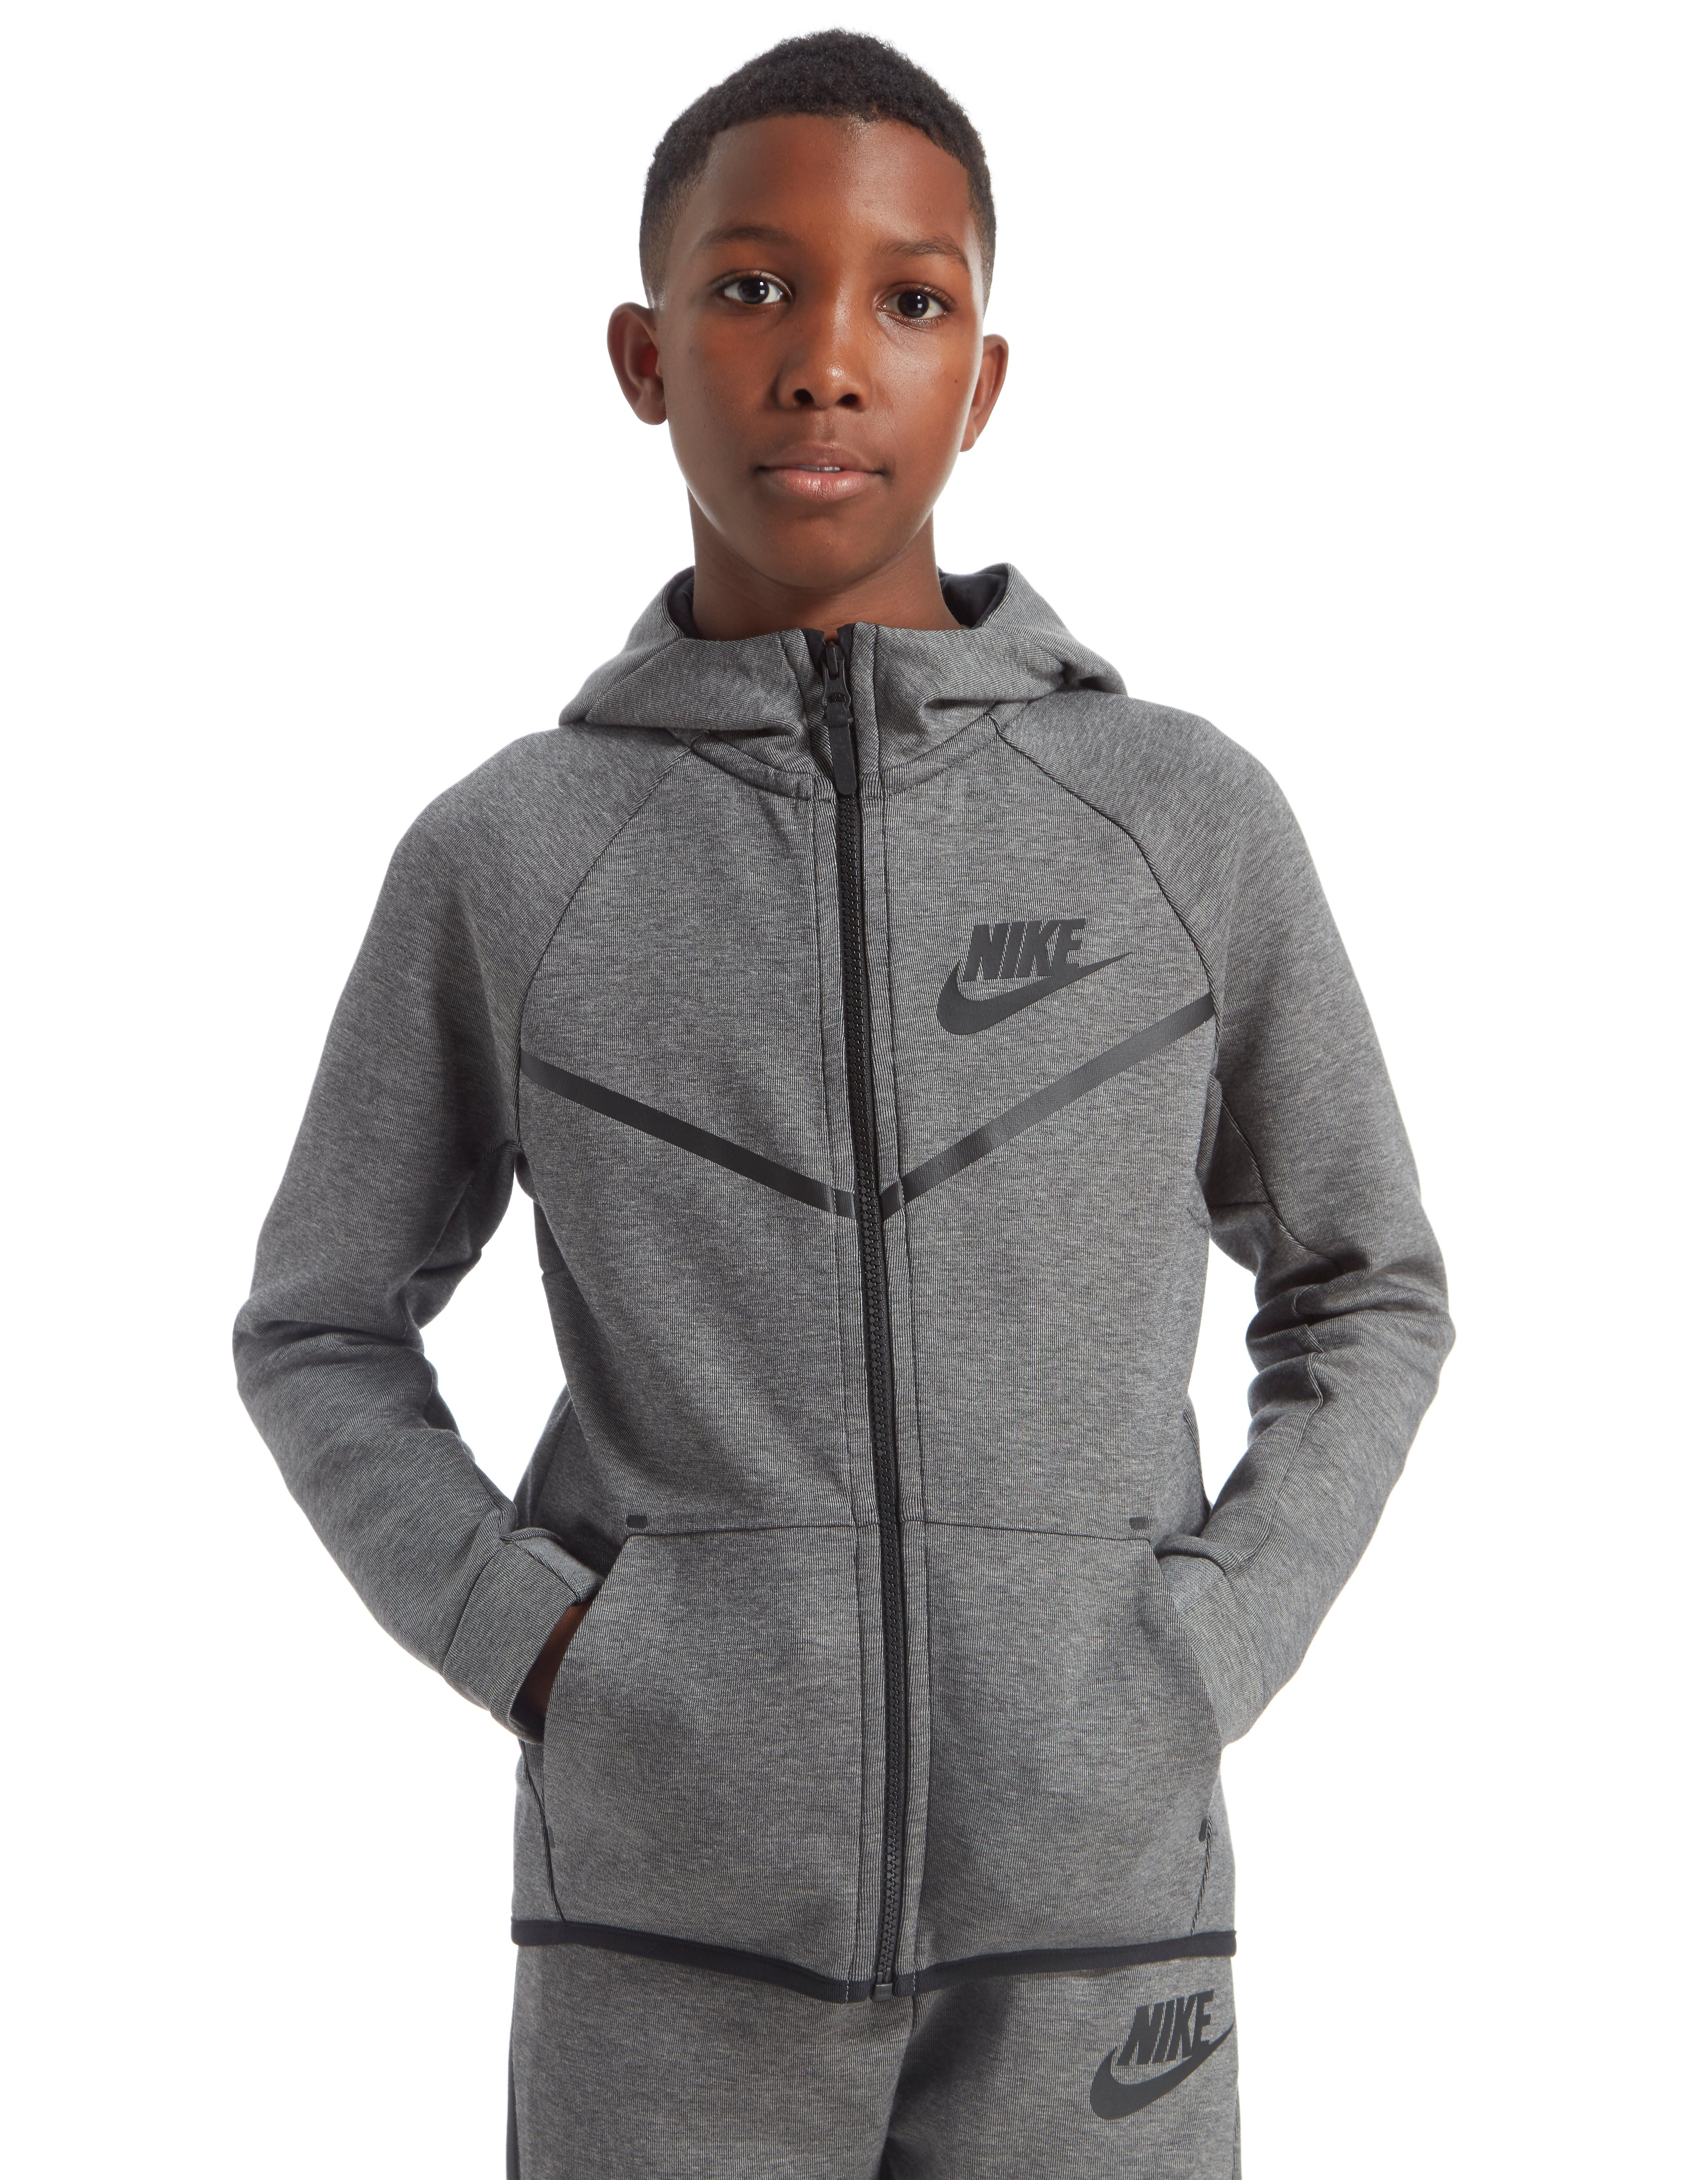 0b6a9c21e5b Nike Tech Windrunner Hoody Junior - Dark Grey/Black - Kids - Sports ...